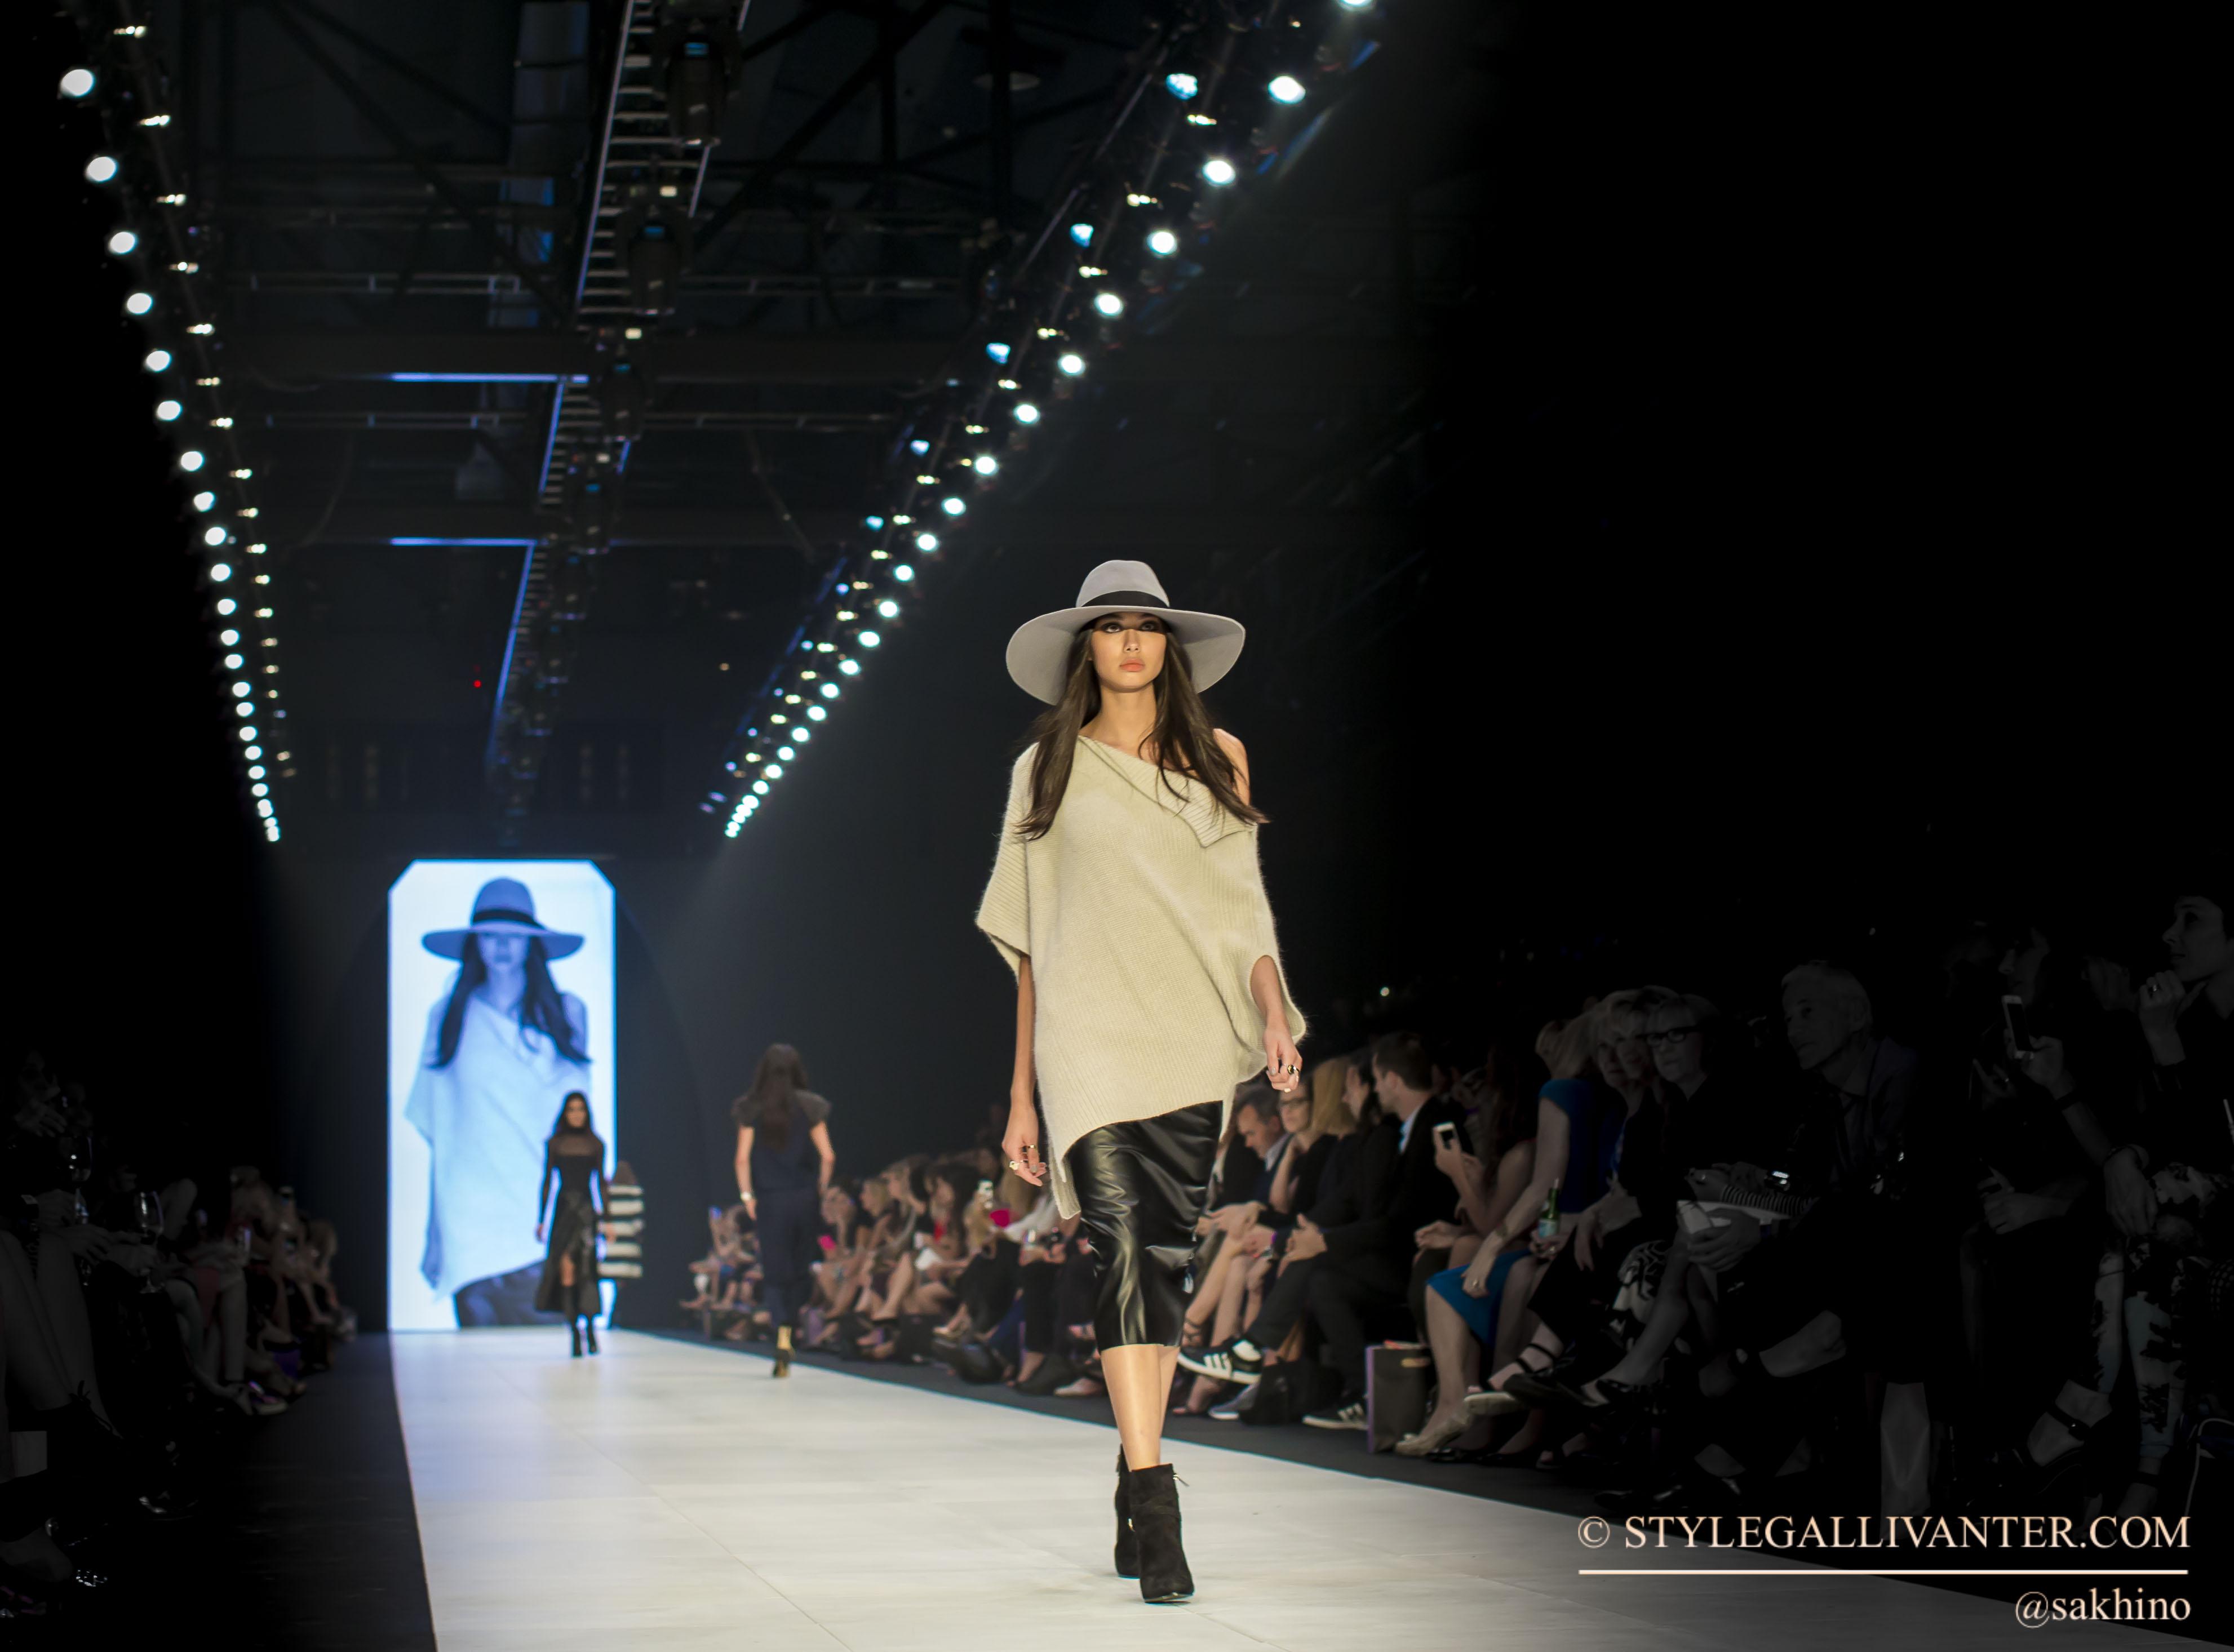 stylegallivanter_VAMFF-2015_VAMFF2015_VAMFF15_MELBOURNE-FASHION-WEEKS-2015_best-dressed-VAMFF-2015_YEOJI-BAE-VAMFF-2015_VAMFF-bloggers-2015_CARLA-ZAMPATTI-2015-VAMFF-6